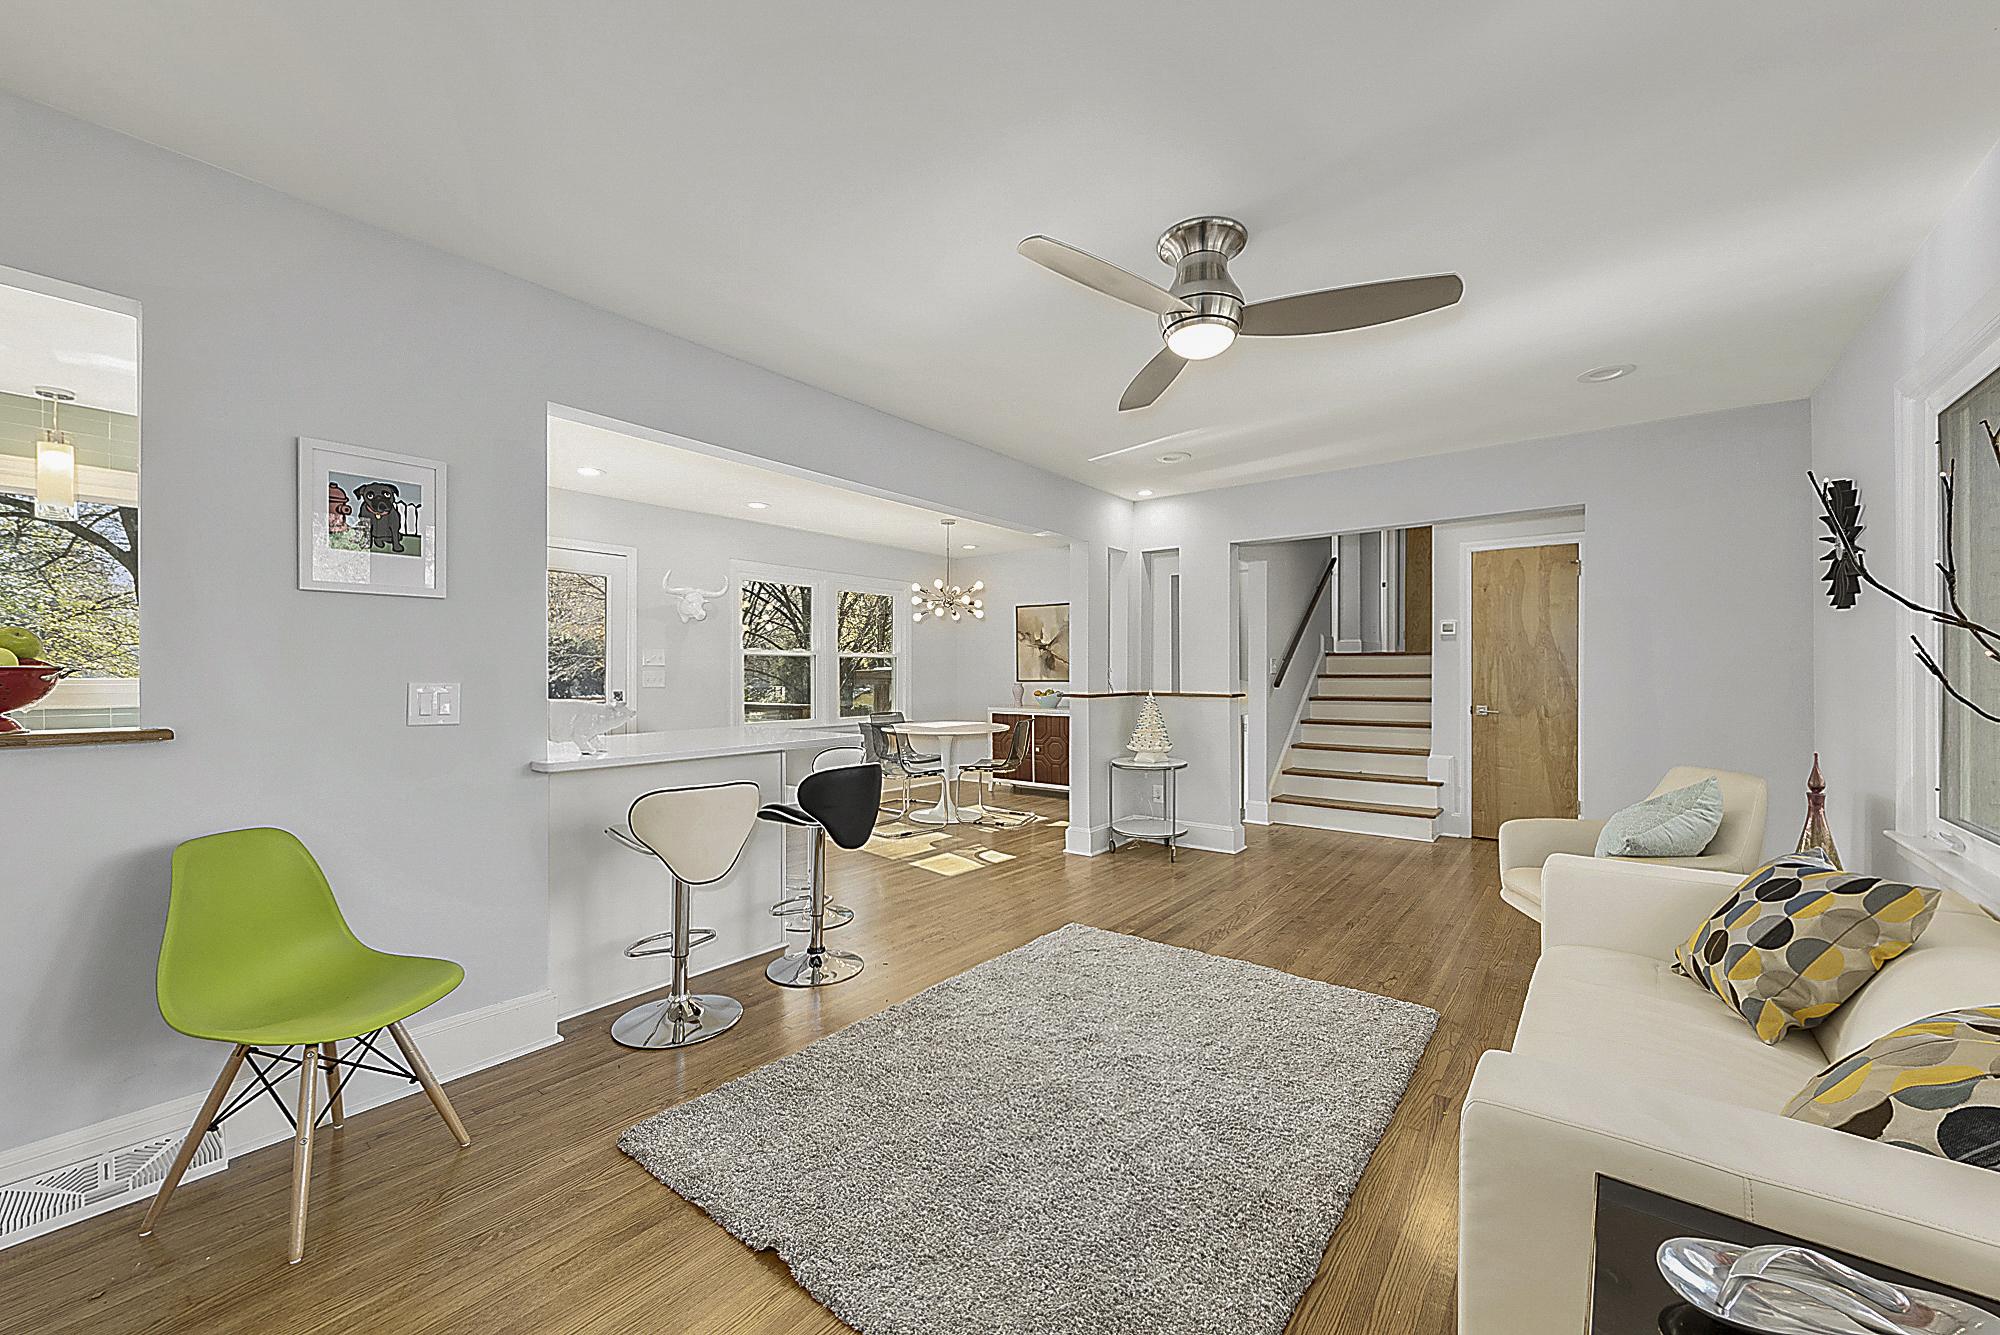 Retro living space